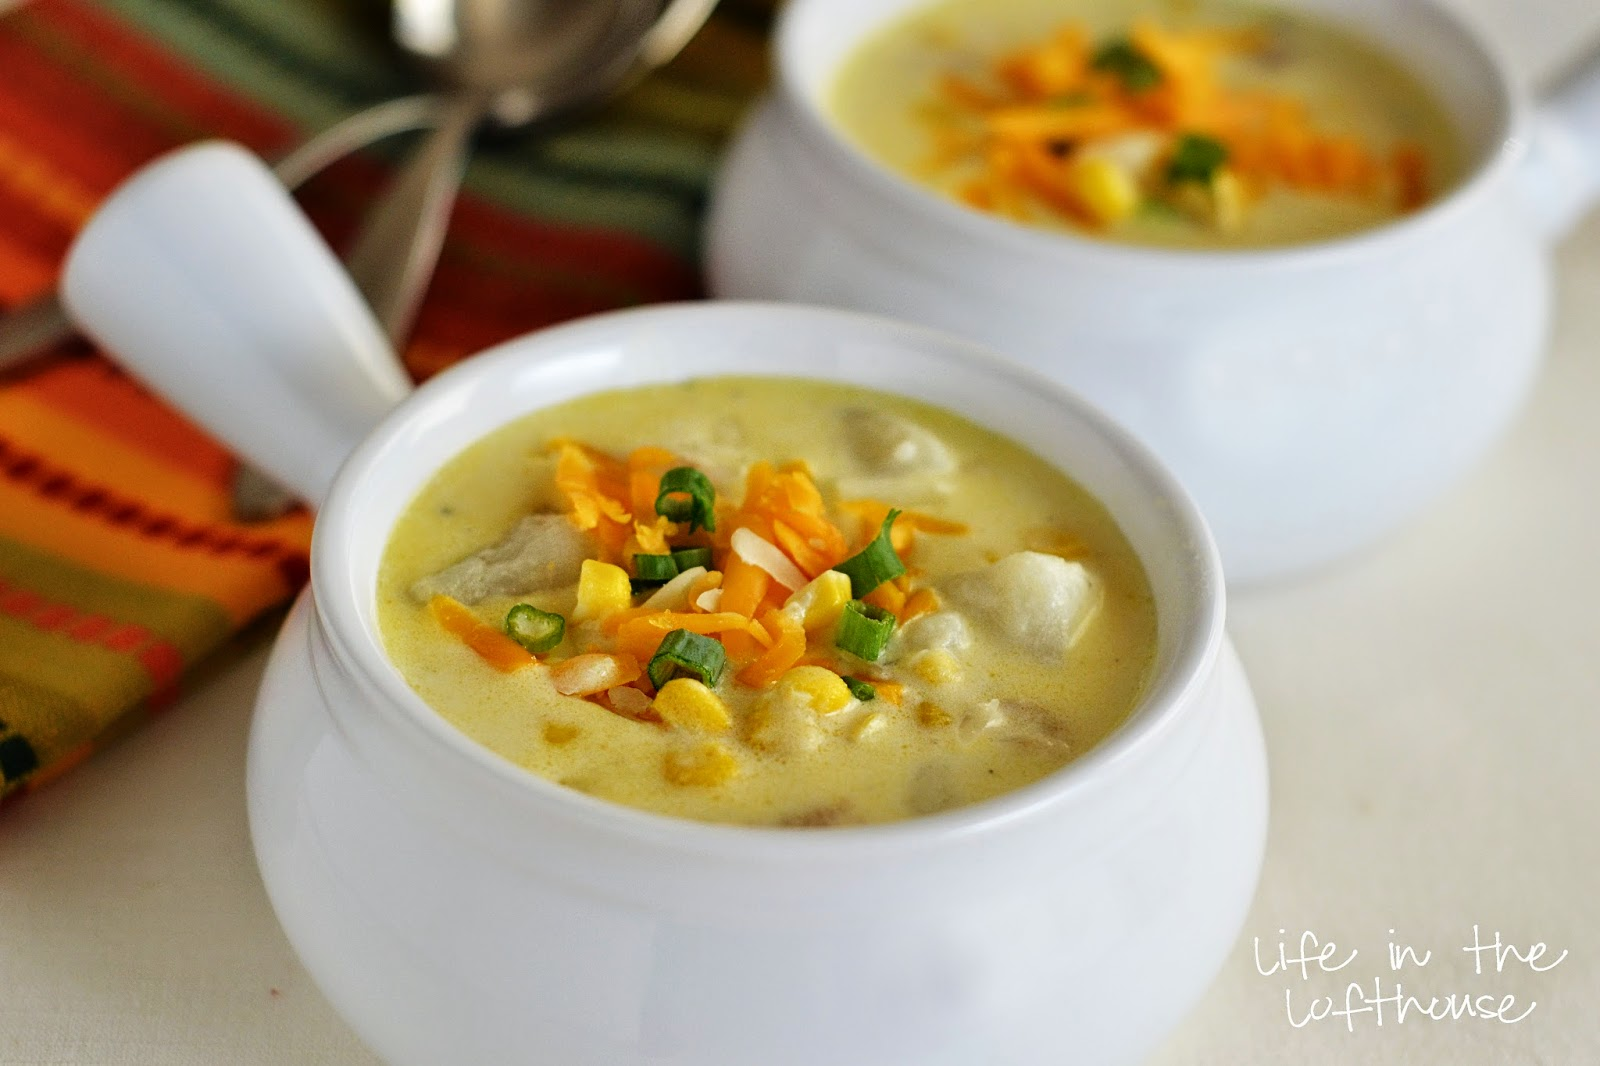 how to make chili soup